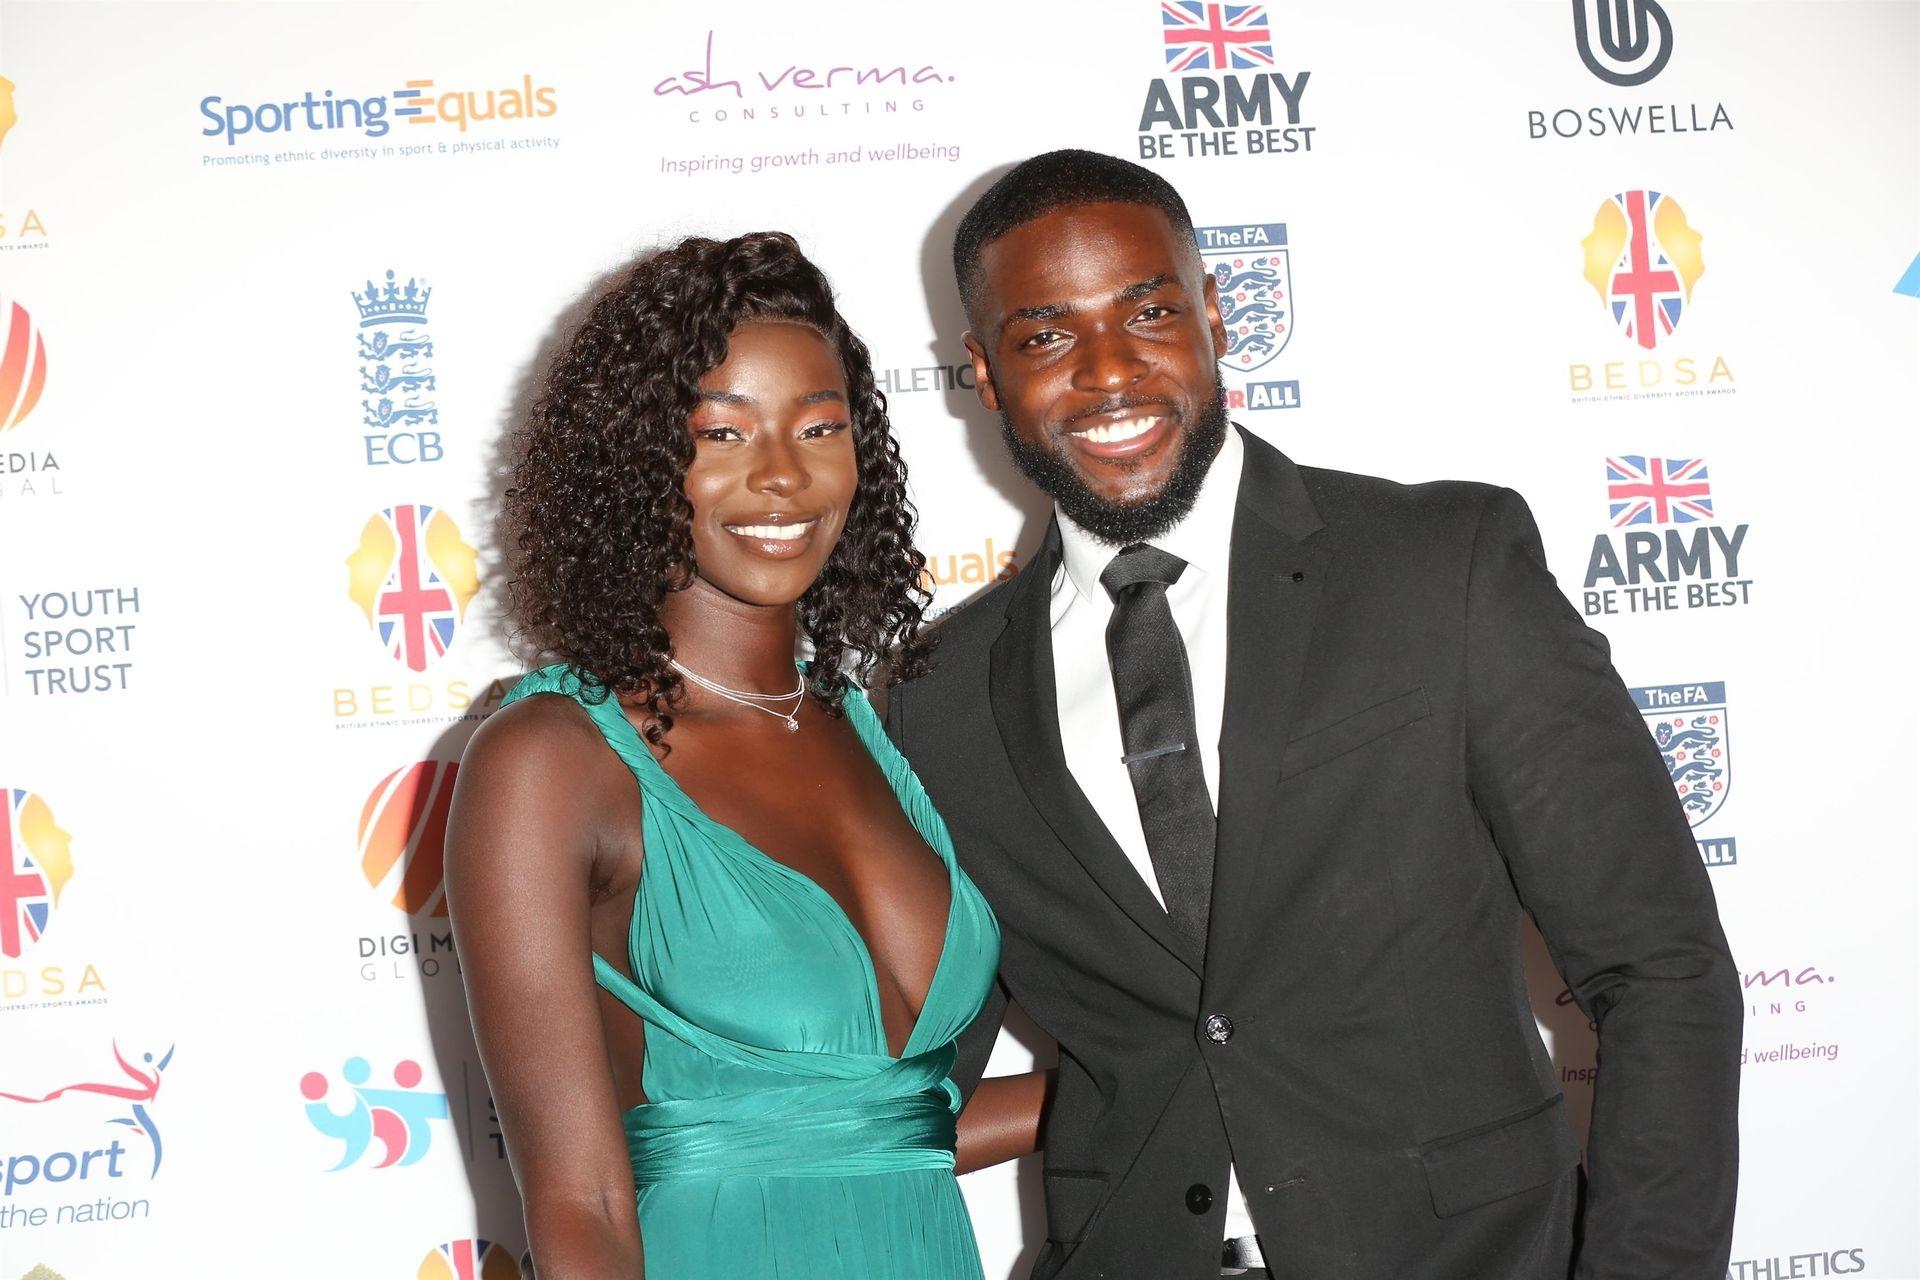 Mike Boateng & Priscilla Anyabu Are Seen At British Ethnic Diversity Sports Awards 0016